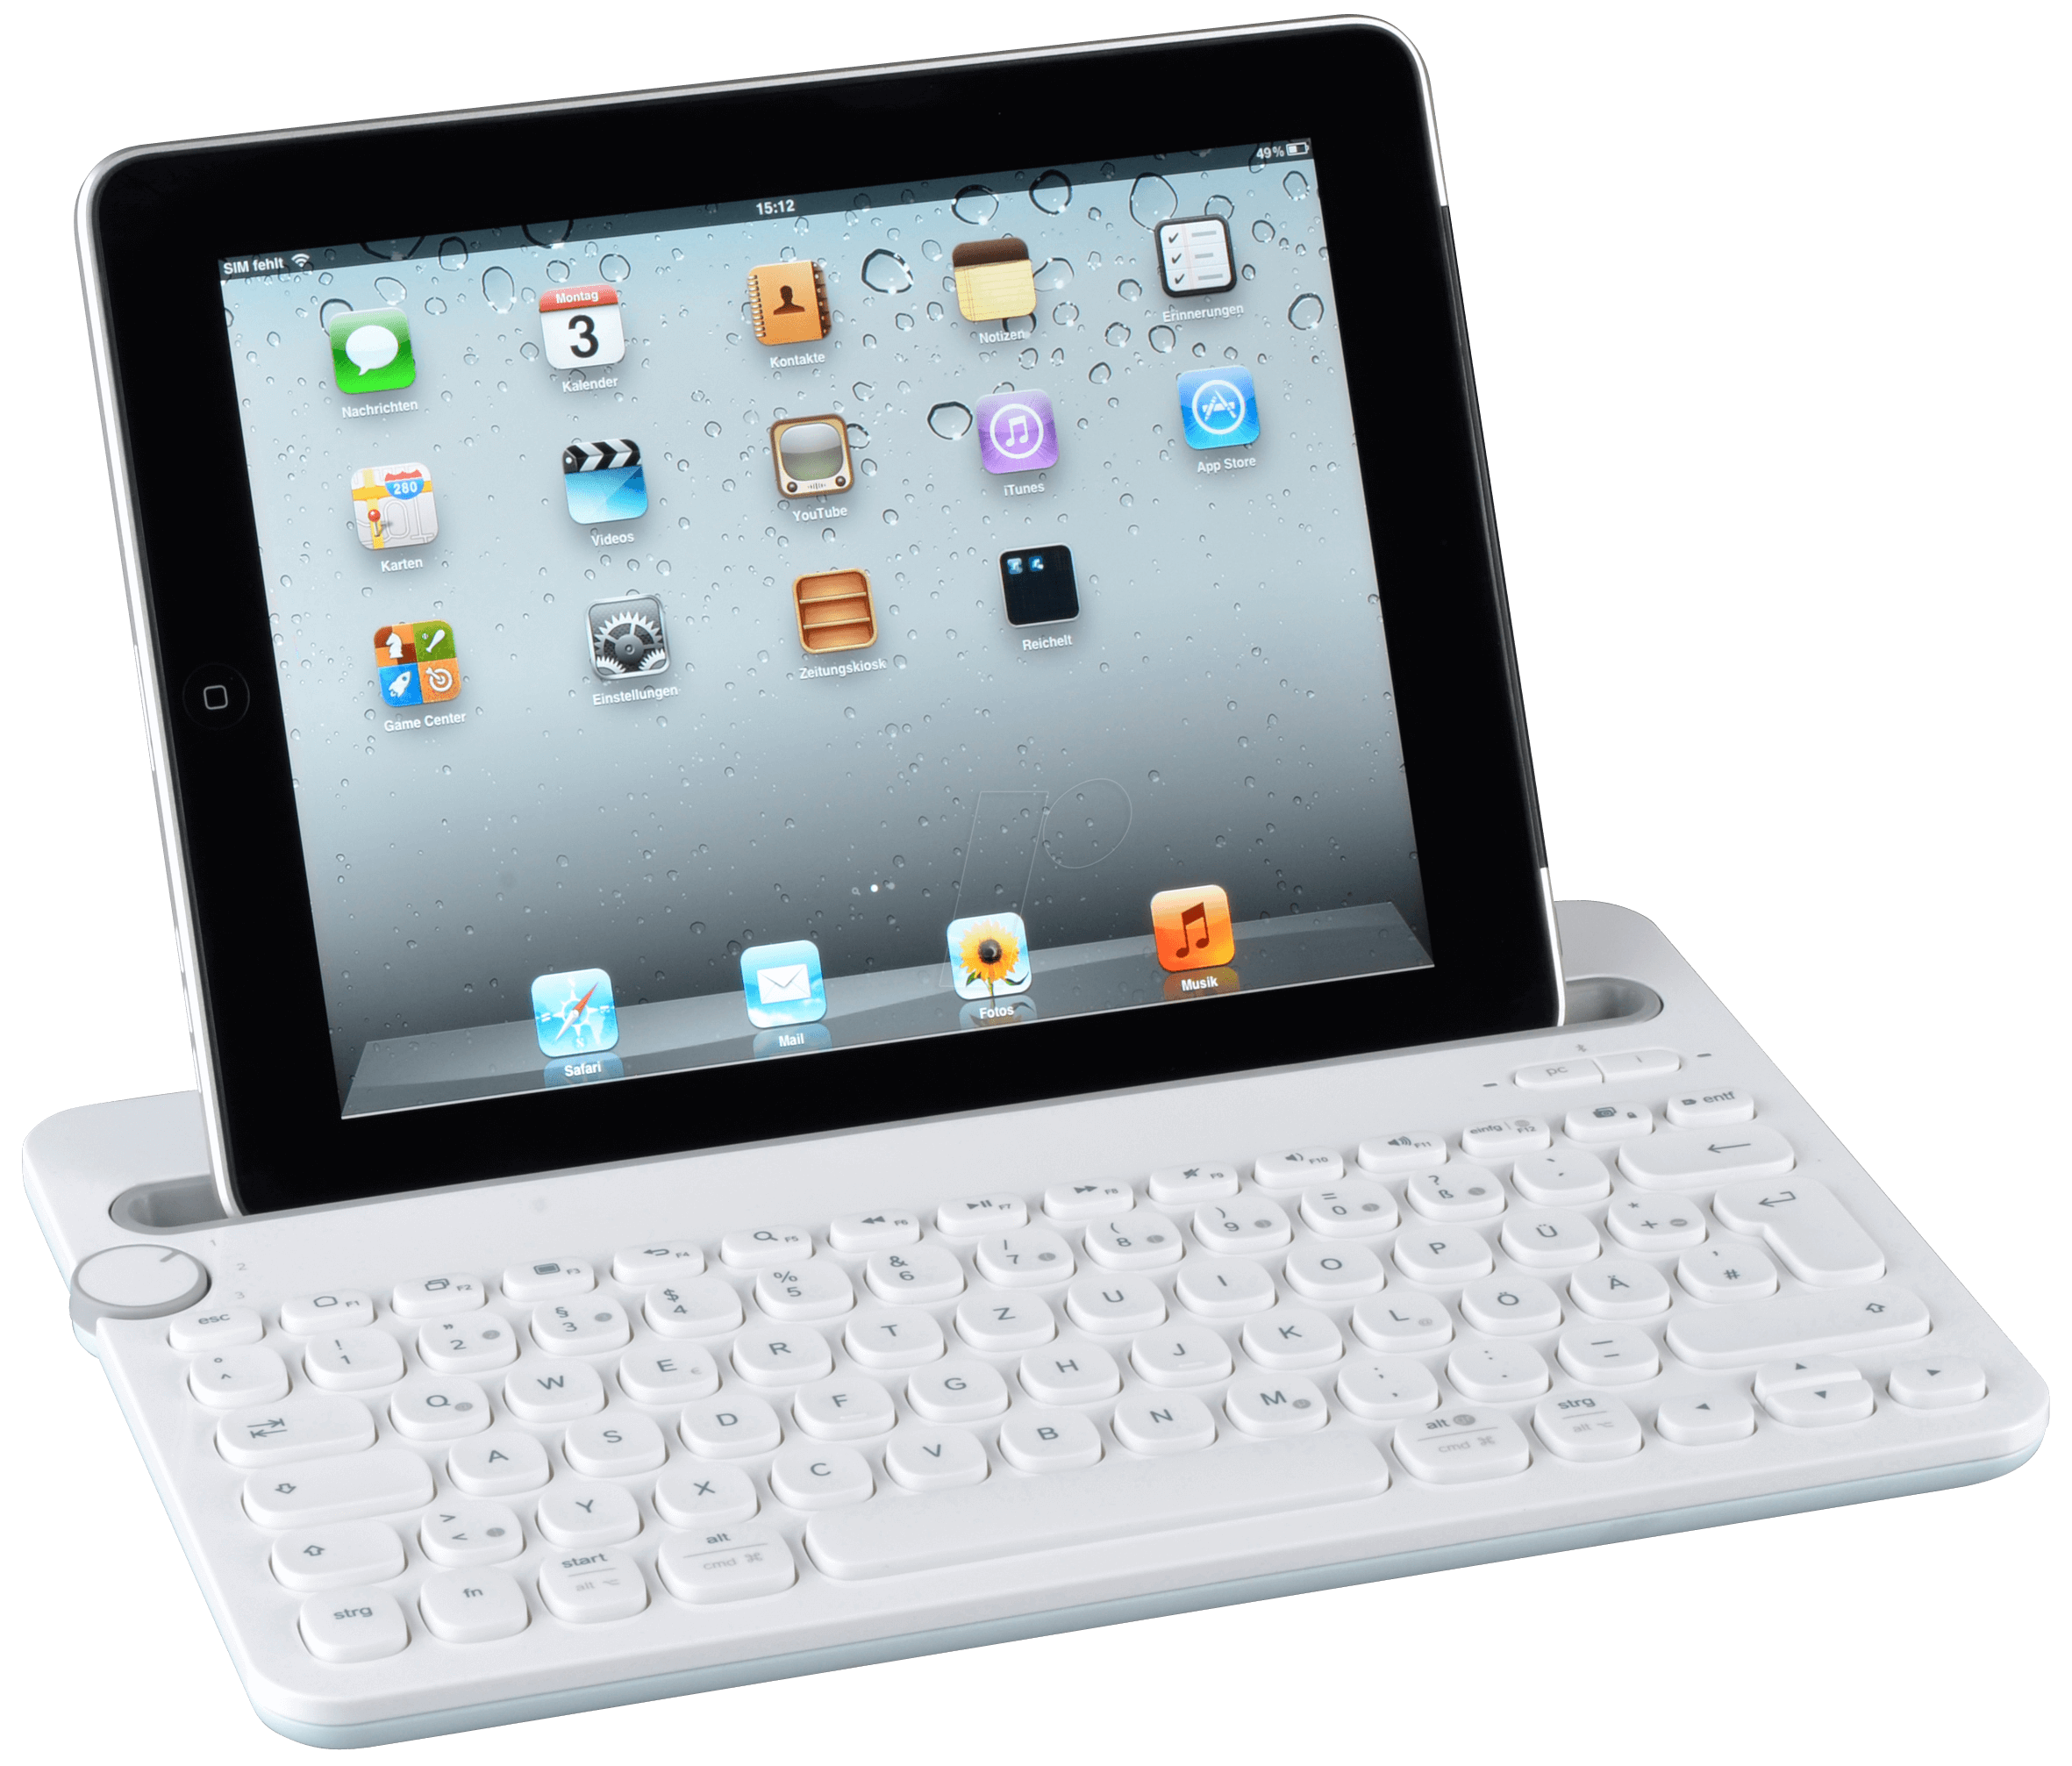 Bluetooth Keyboard Apple Android: LOGITECH K480 WS: Bluetooth Multi-device Keyboard Win